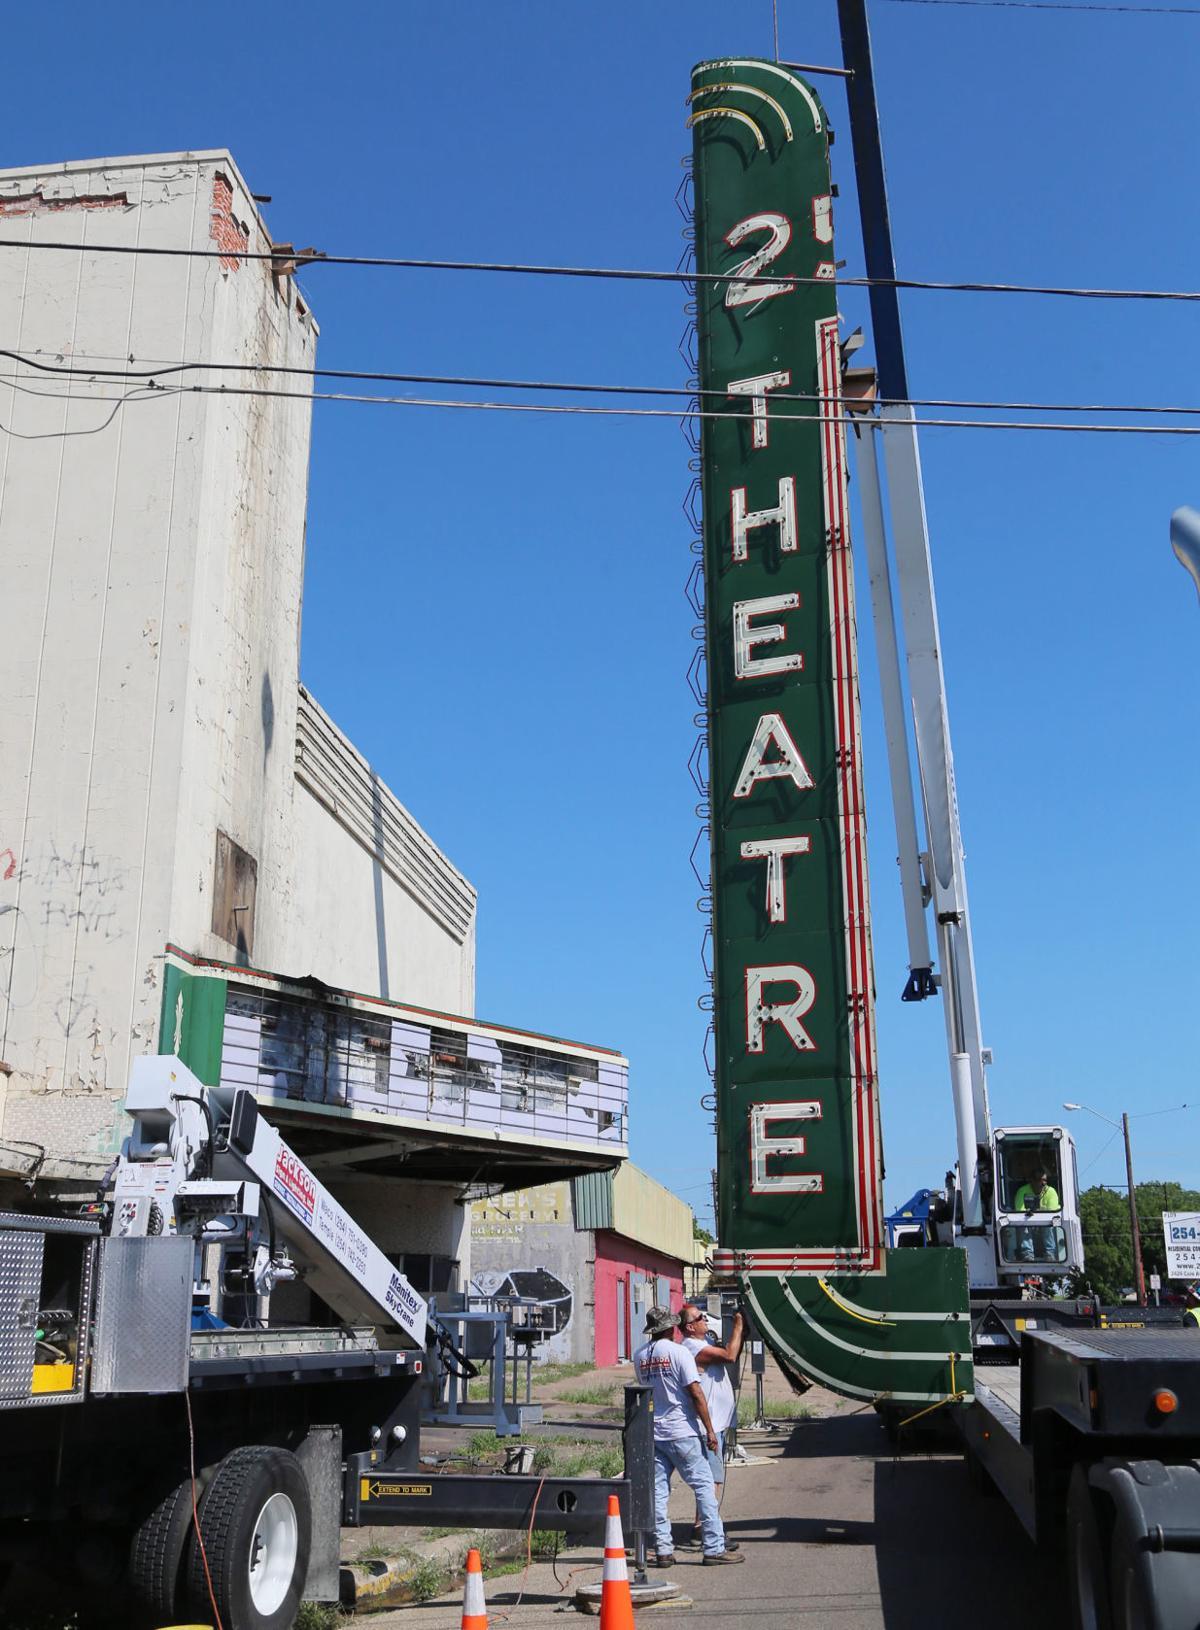 25th street theater